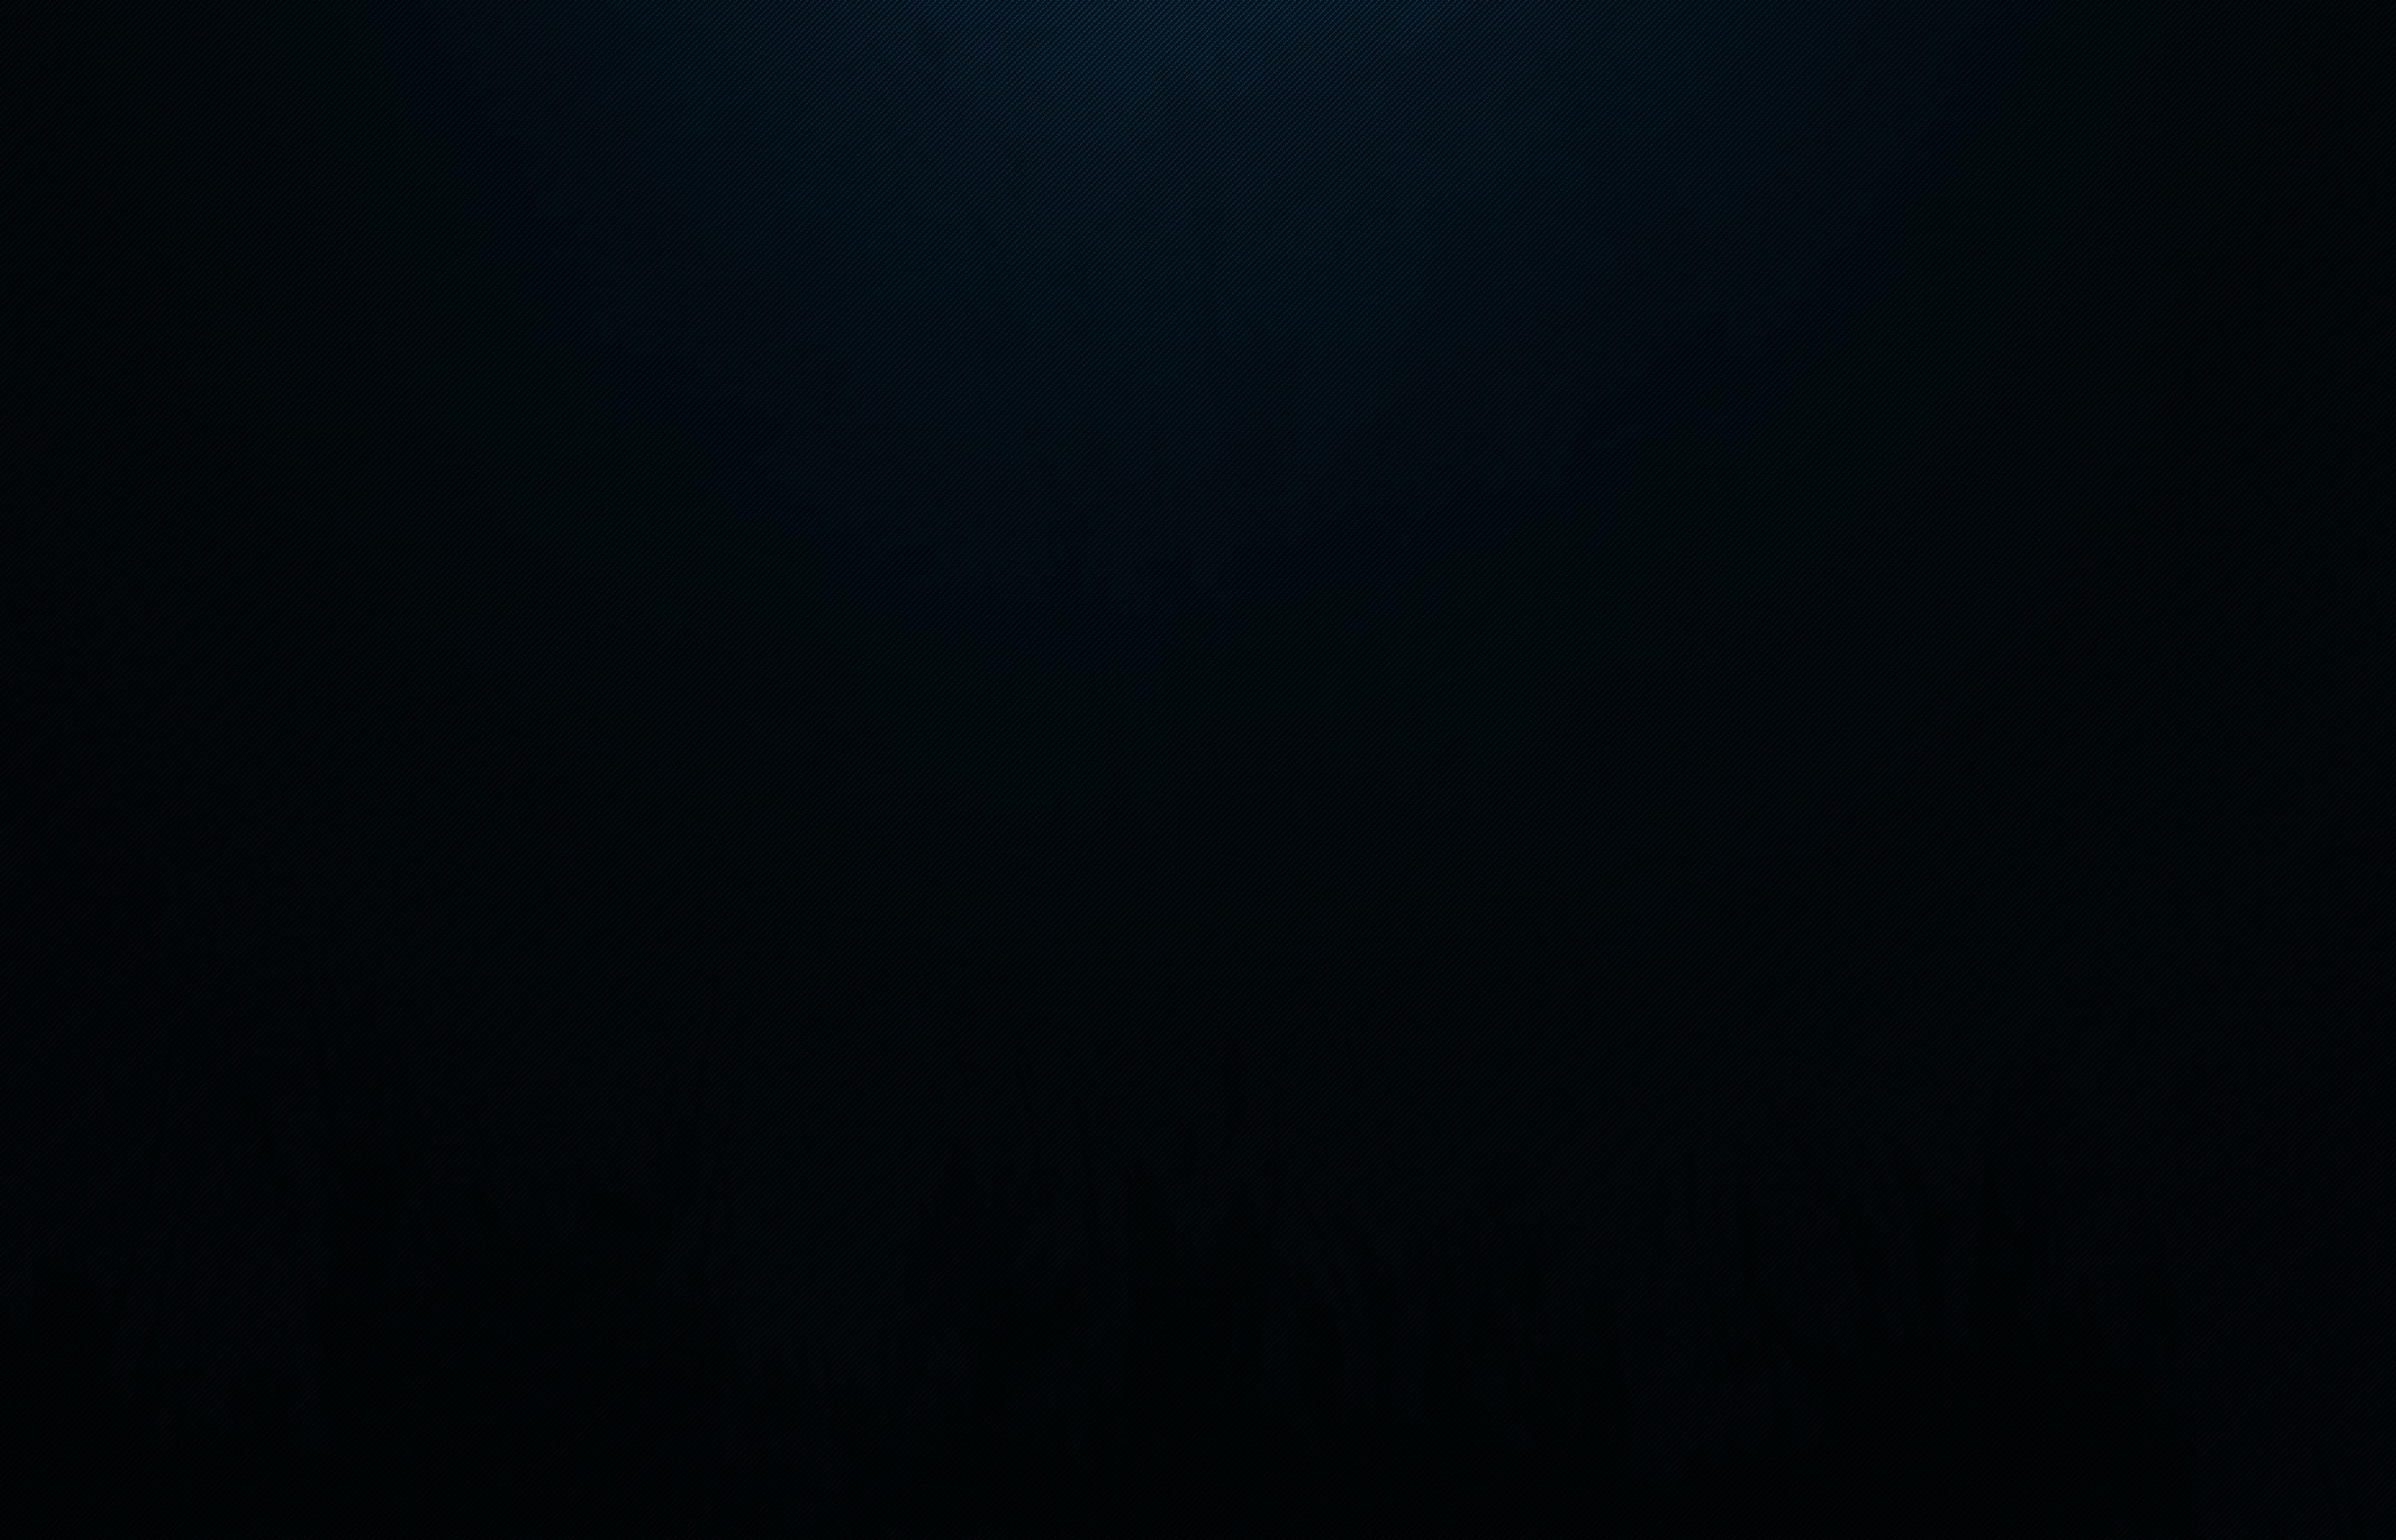 solid navy blue background solid navy blu 2800x1800